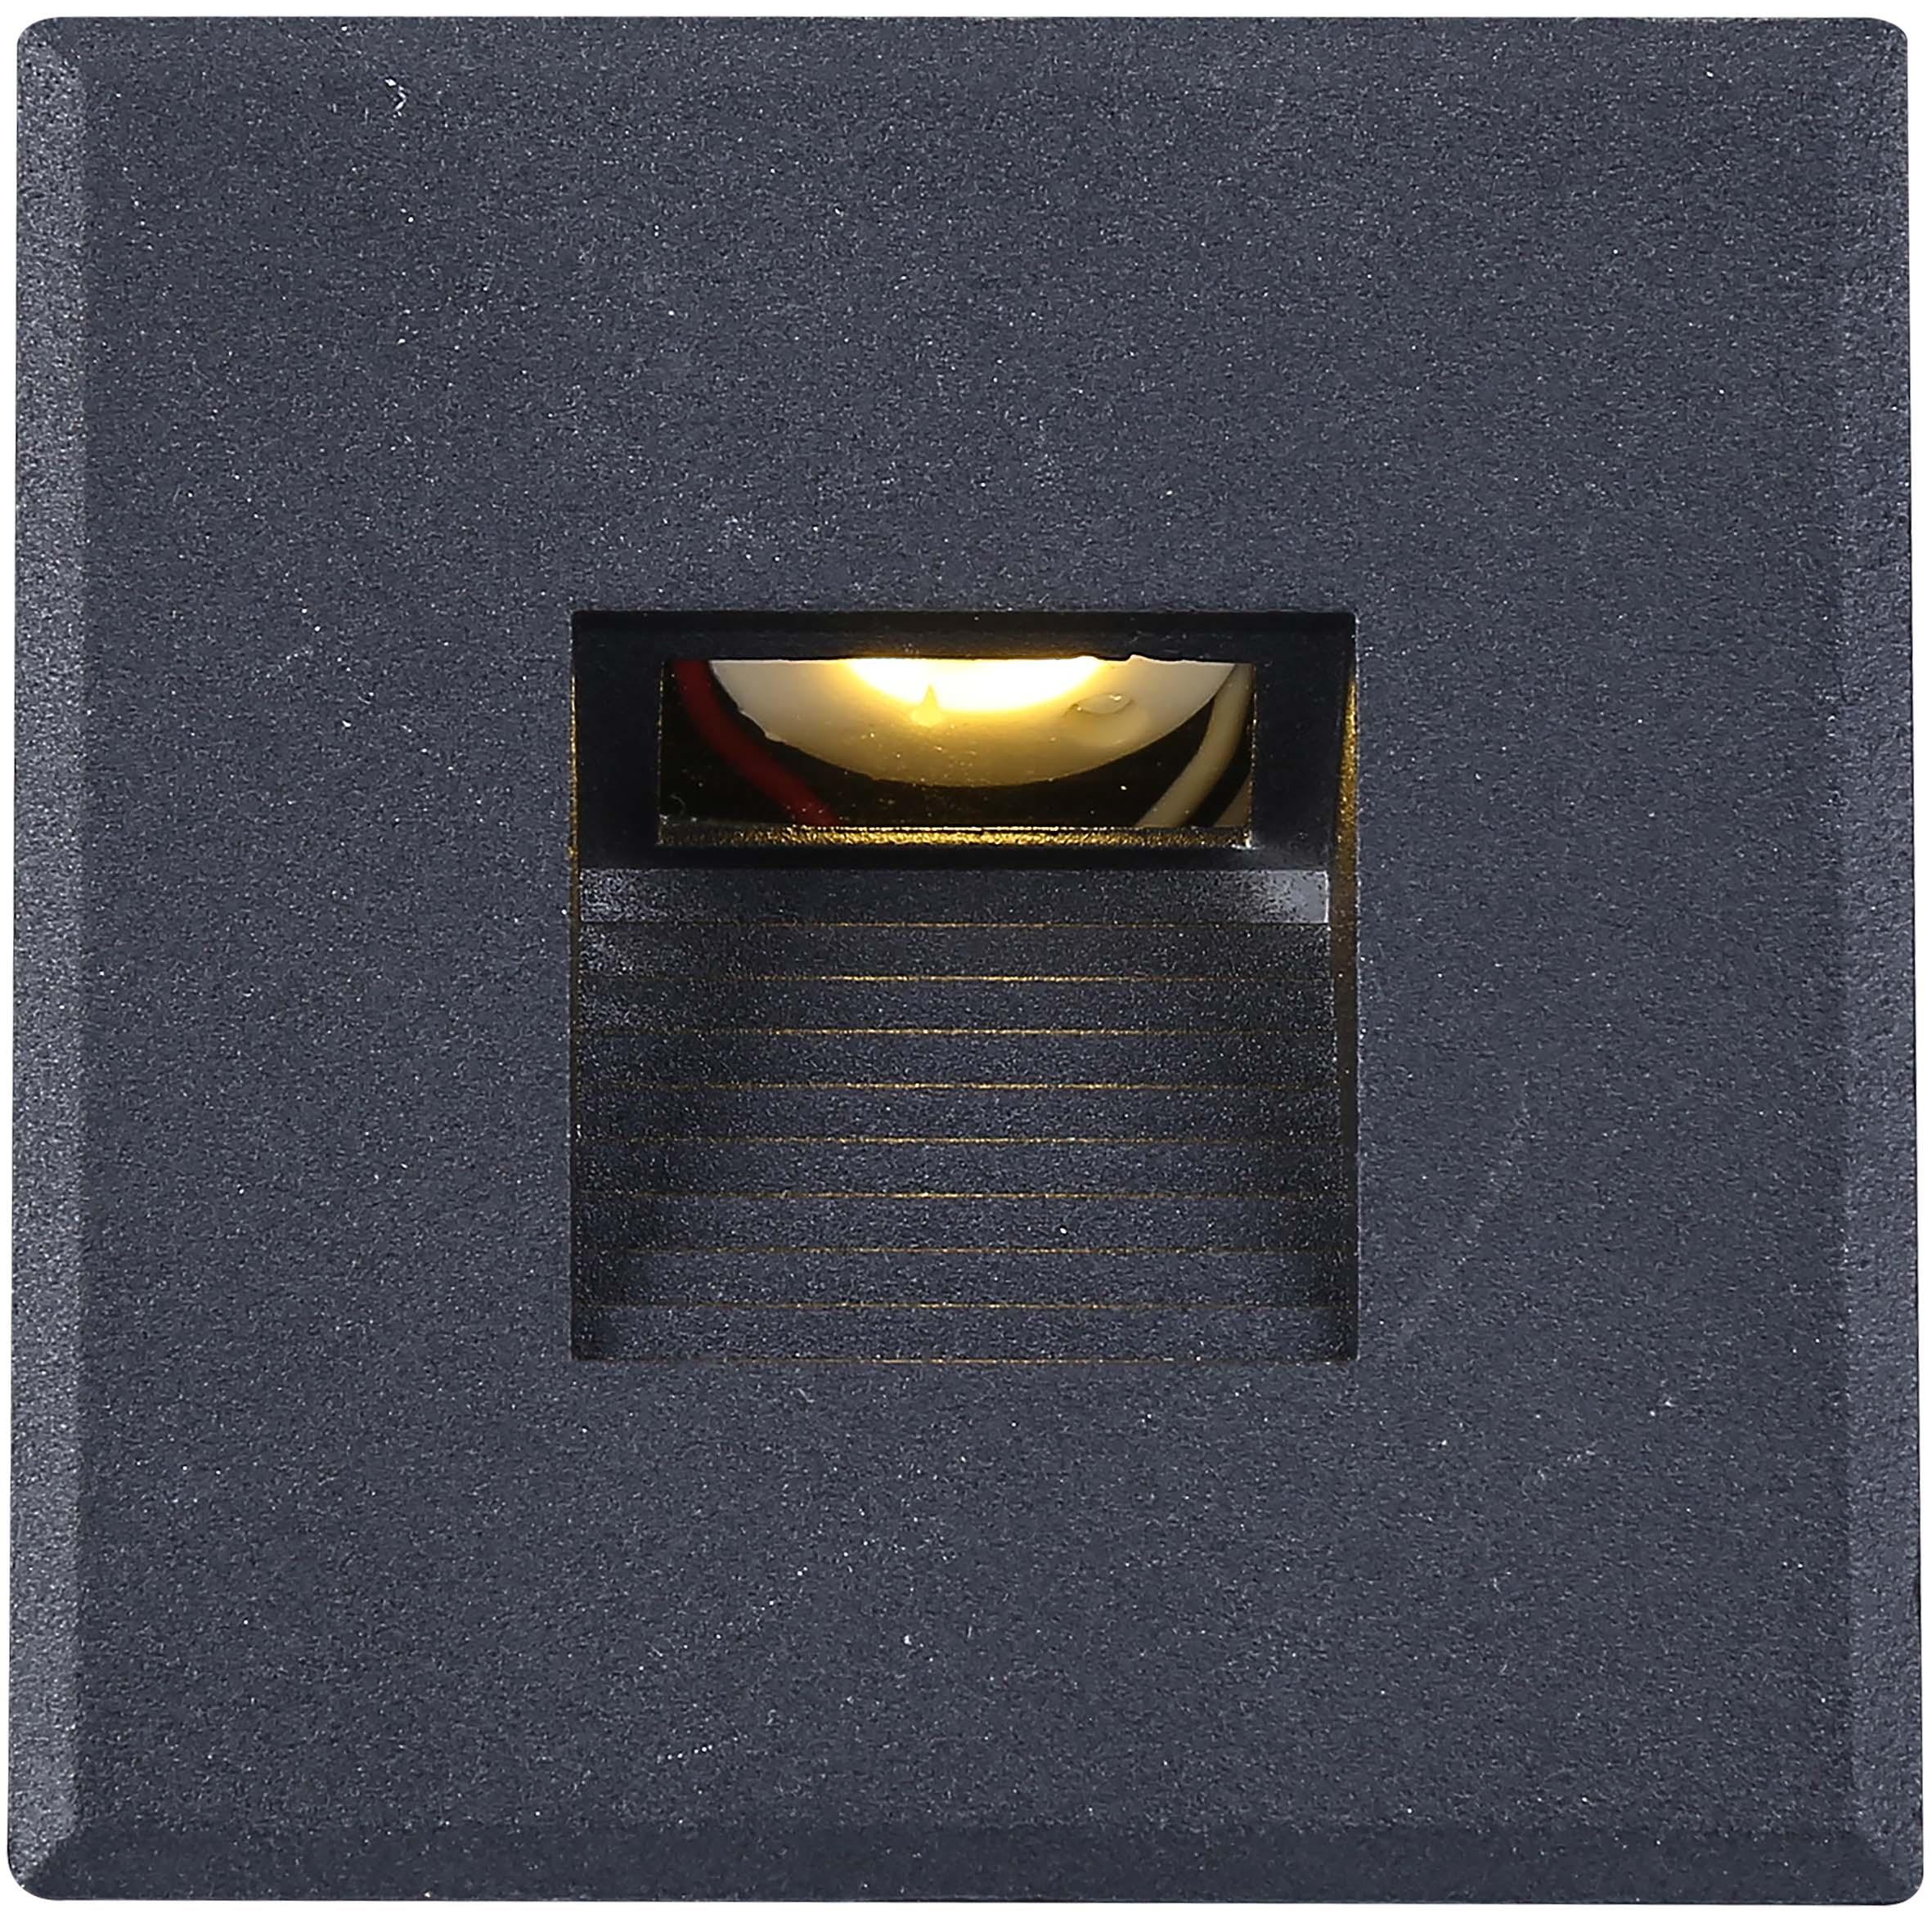 LHT1151_-_Steplight_-_Square_Black_Tier_%28light_ON%29